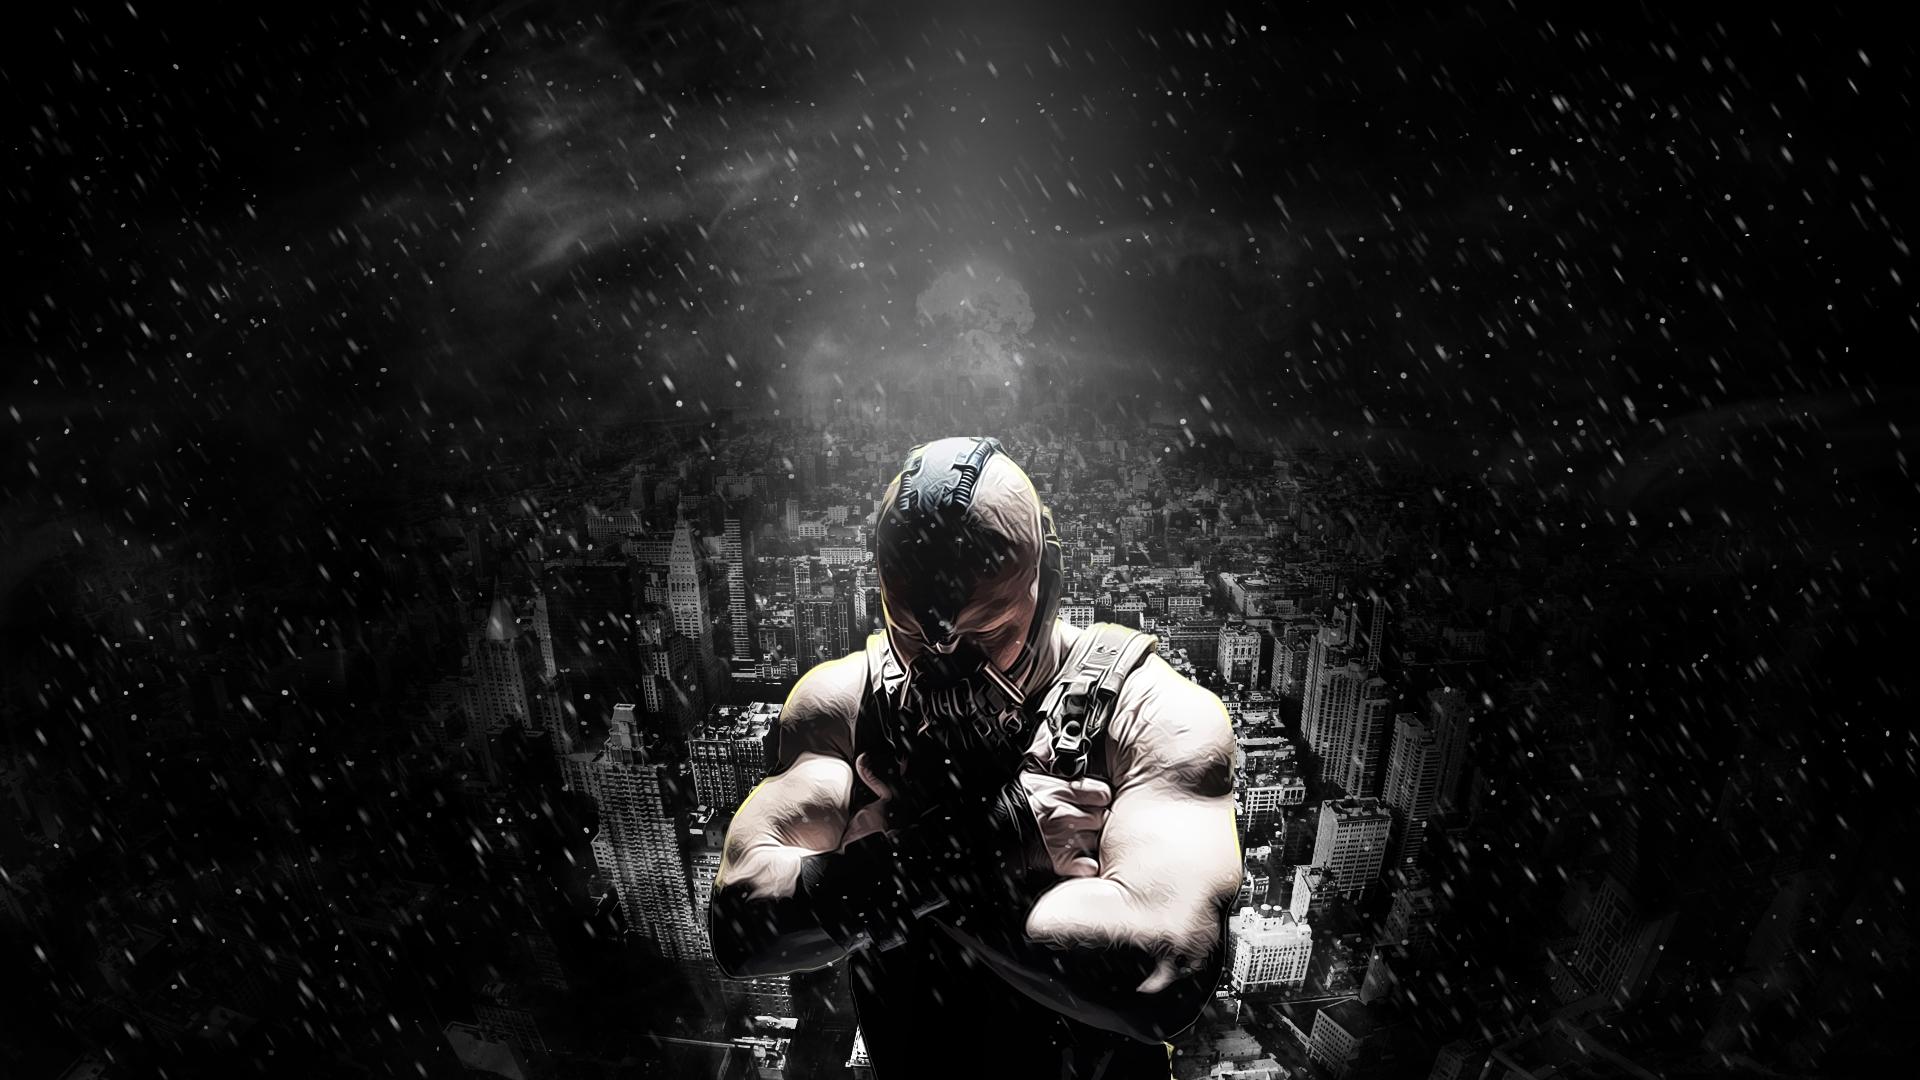 Bane Quotes Wallpapers Free Download Bane Hd Wallpapers Pixelstalk Net